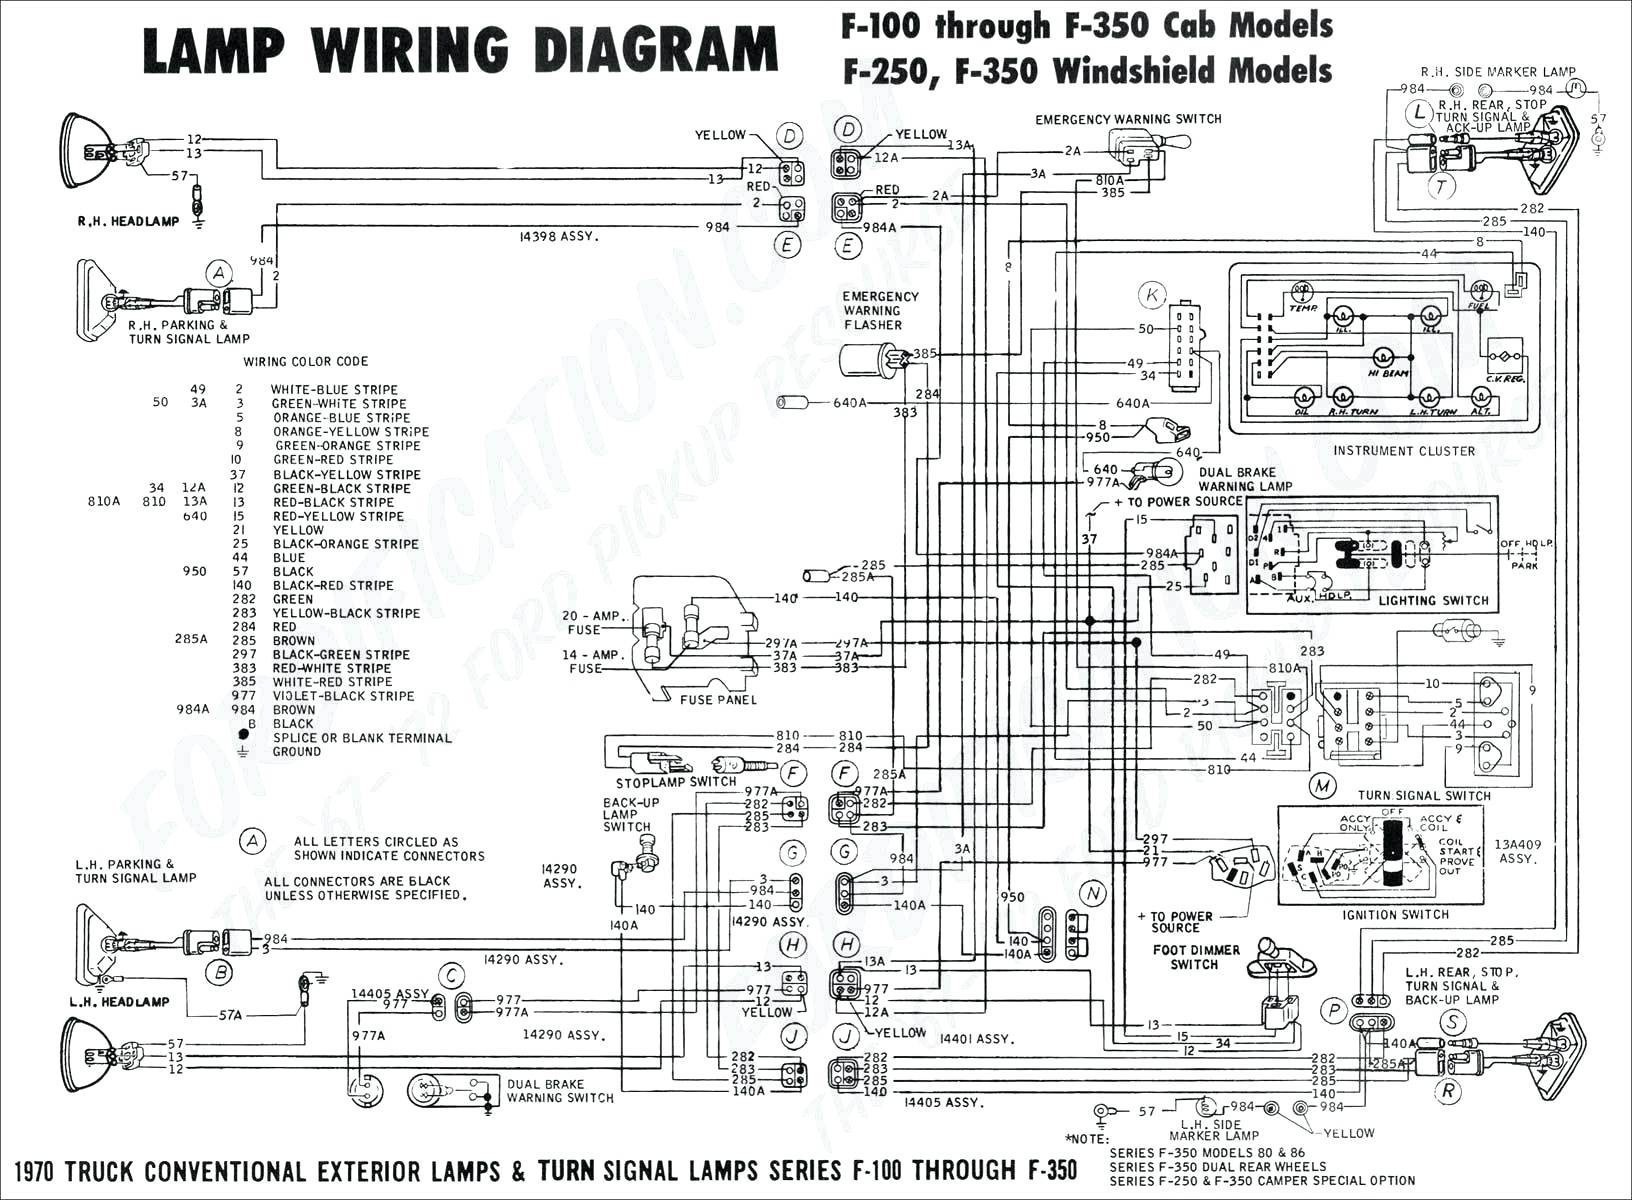 Xbox 360 Power Supply Wiring Diagram Trailer House Wiring Diagram Of Xbox 360 Power Supply Wiring Diagram